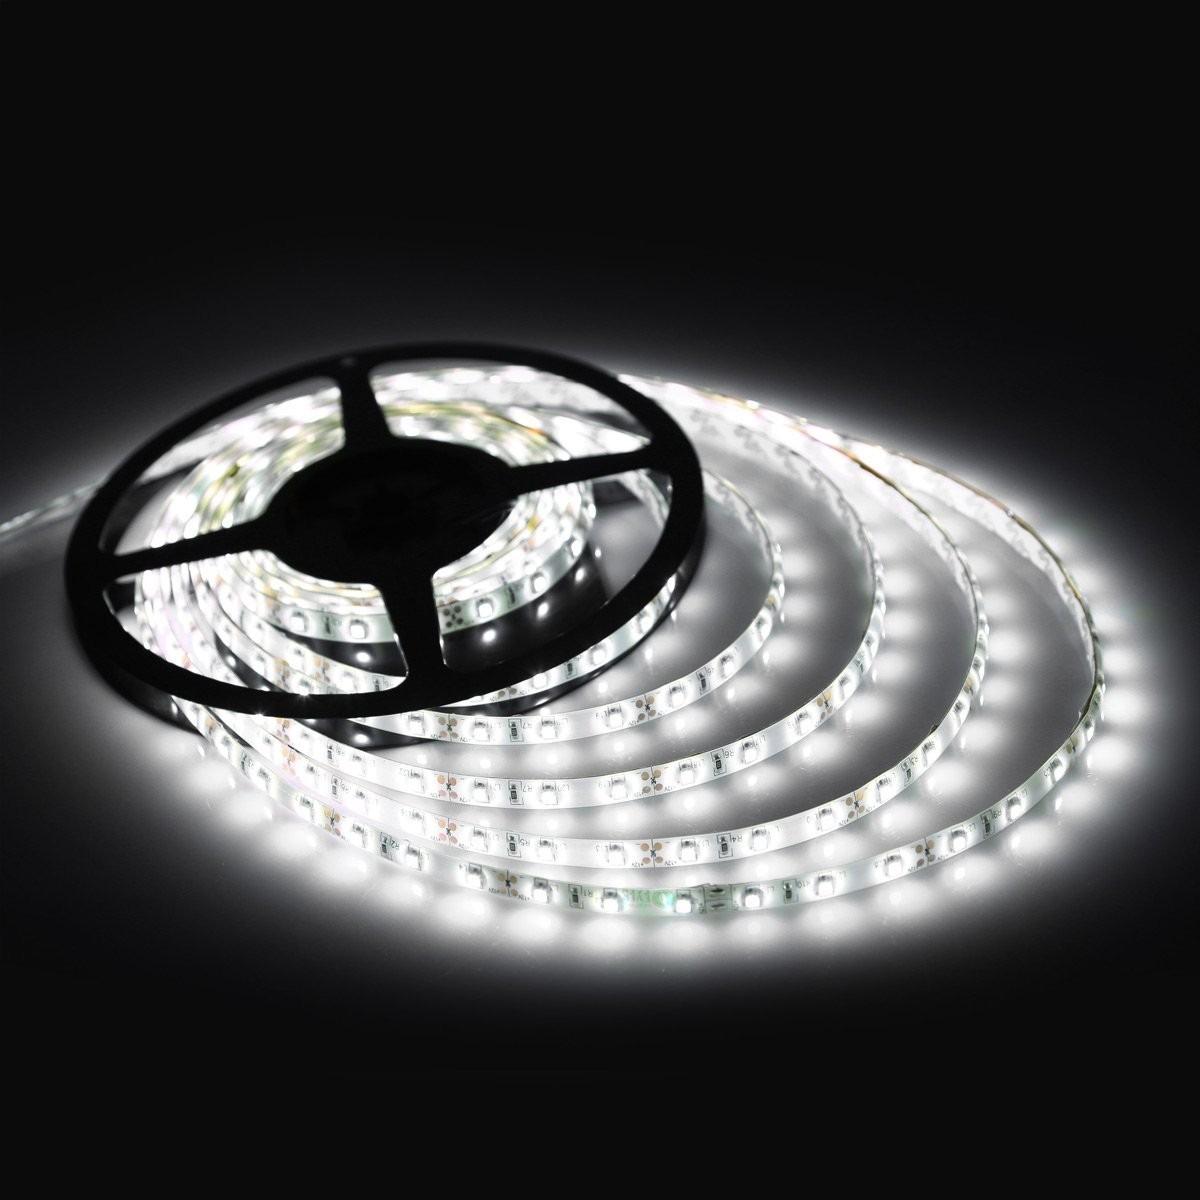 Tira led smd 5050 para interior 300 leds 5 mts un color for Tiras led de colores